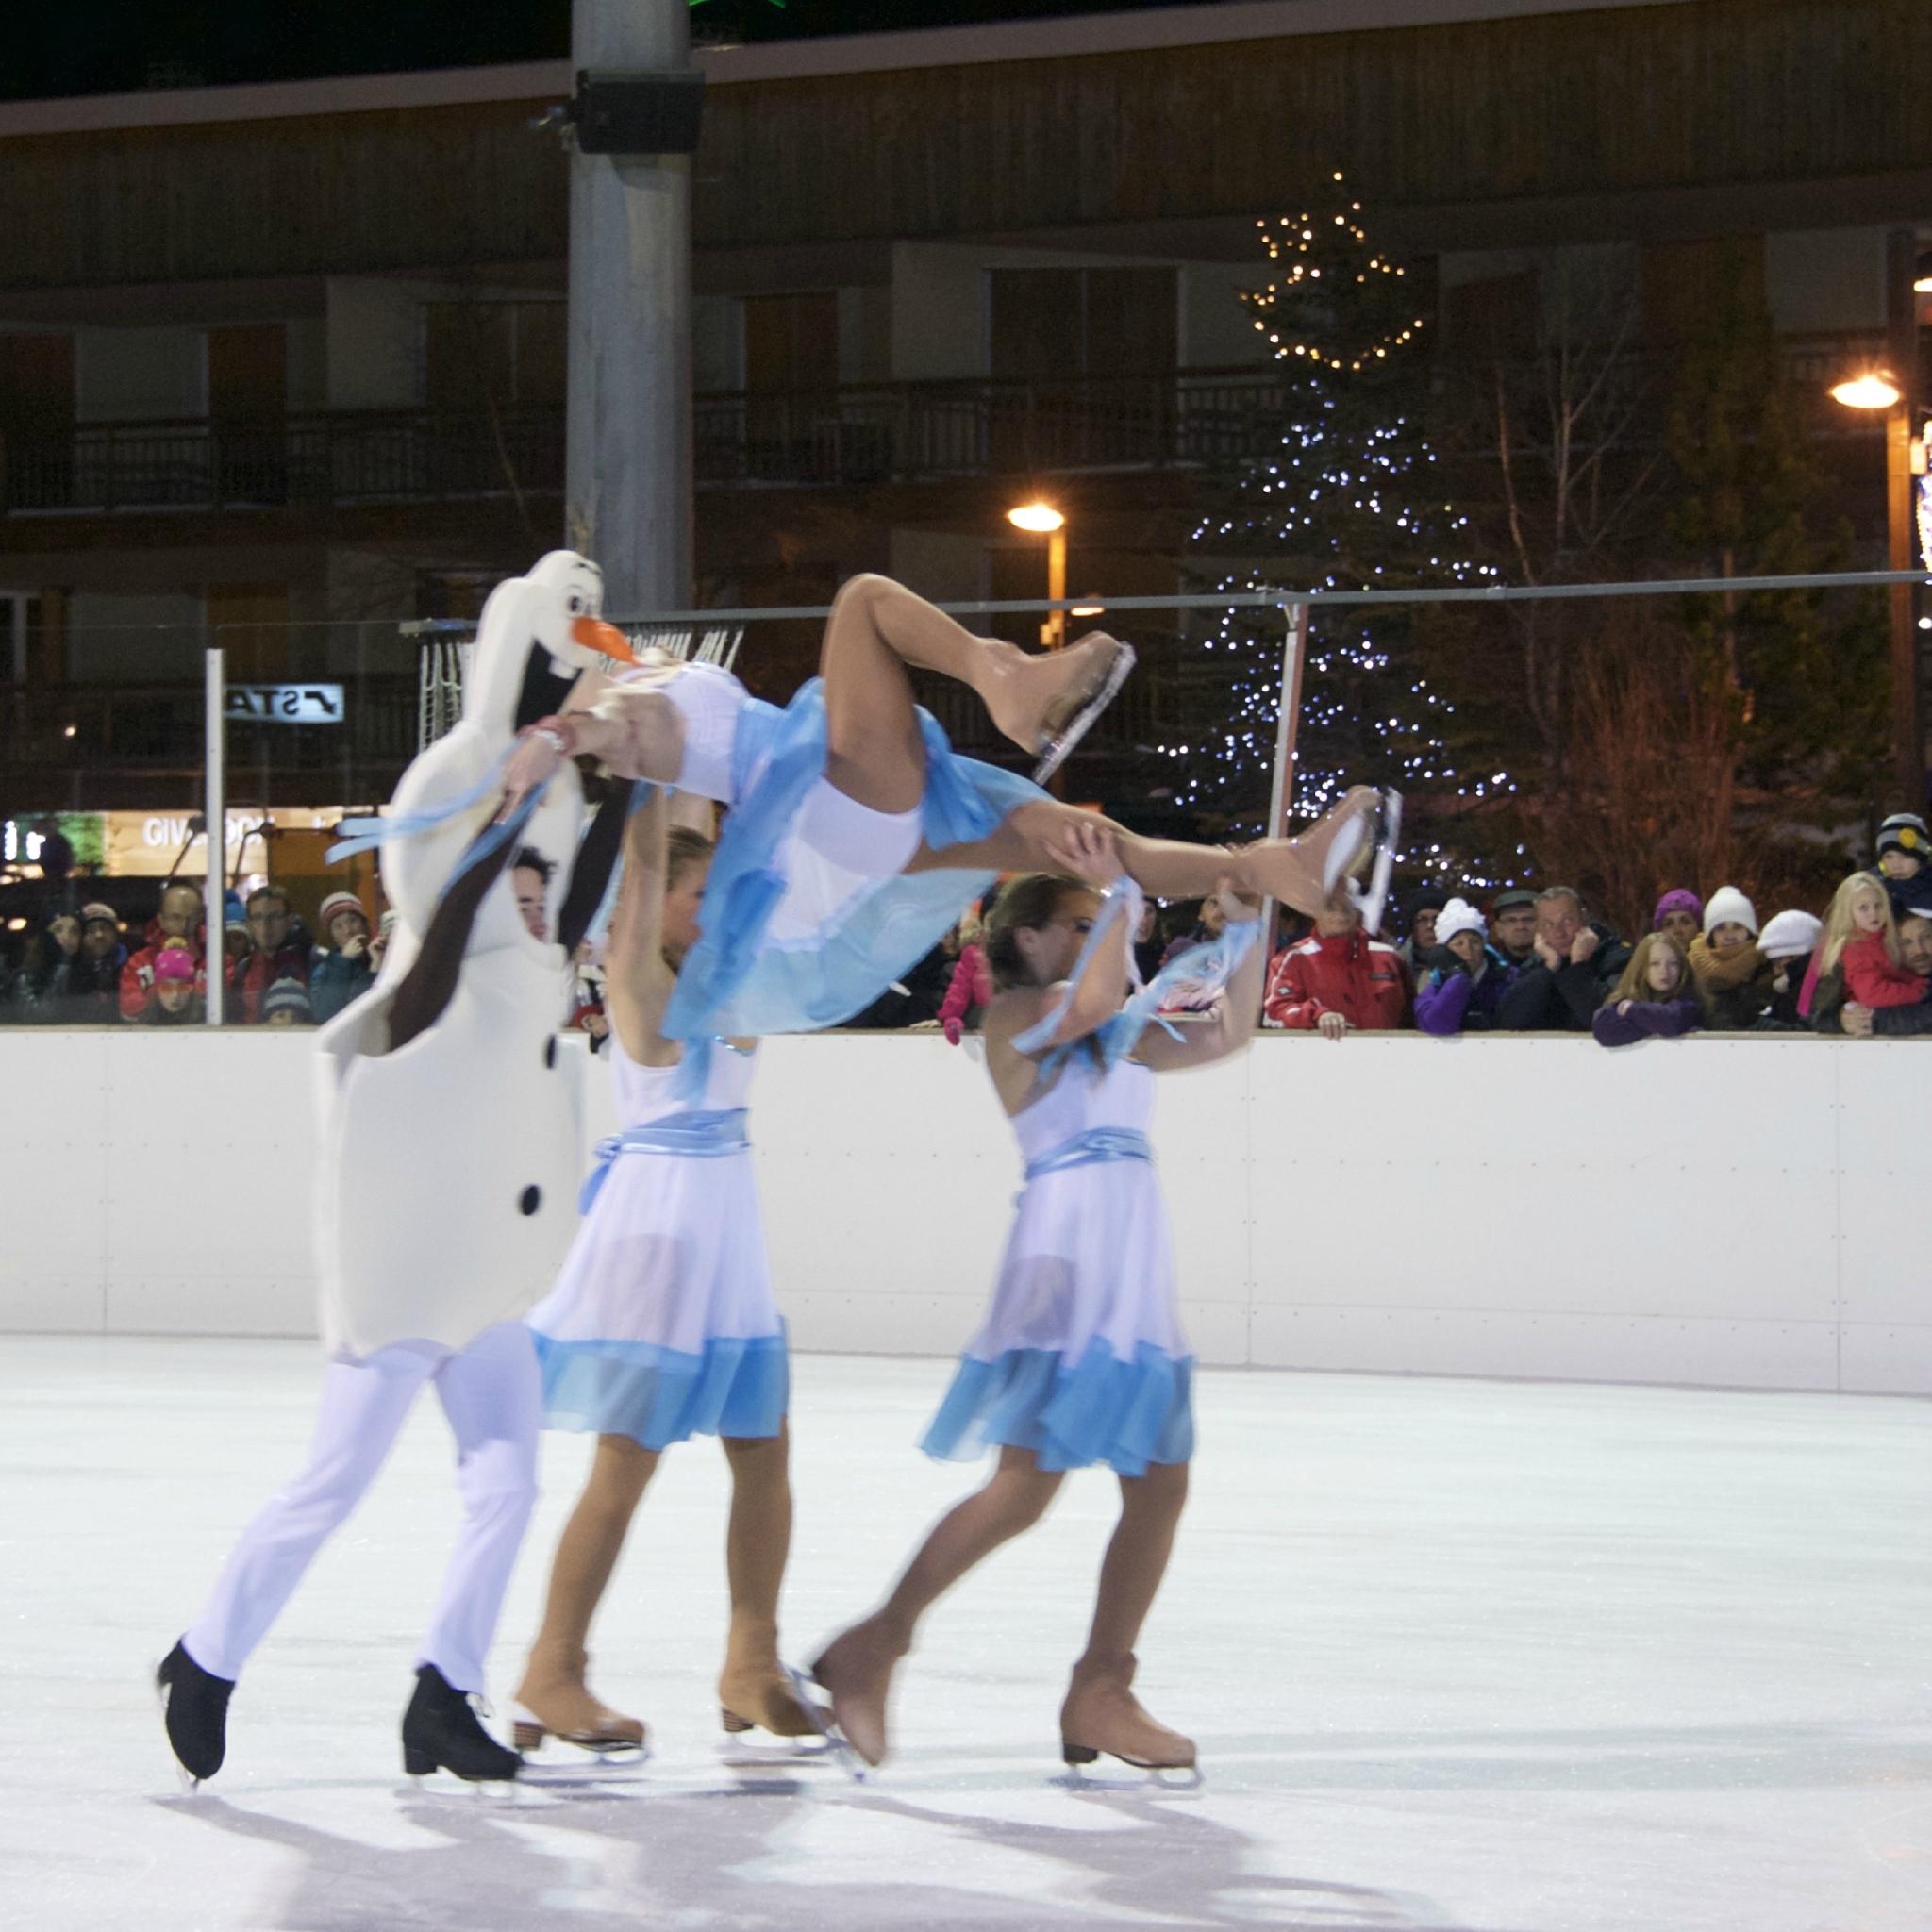 Gala janvier - 142